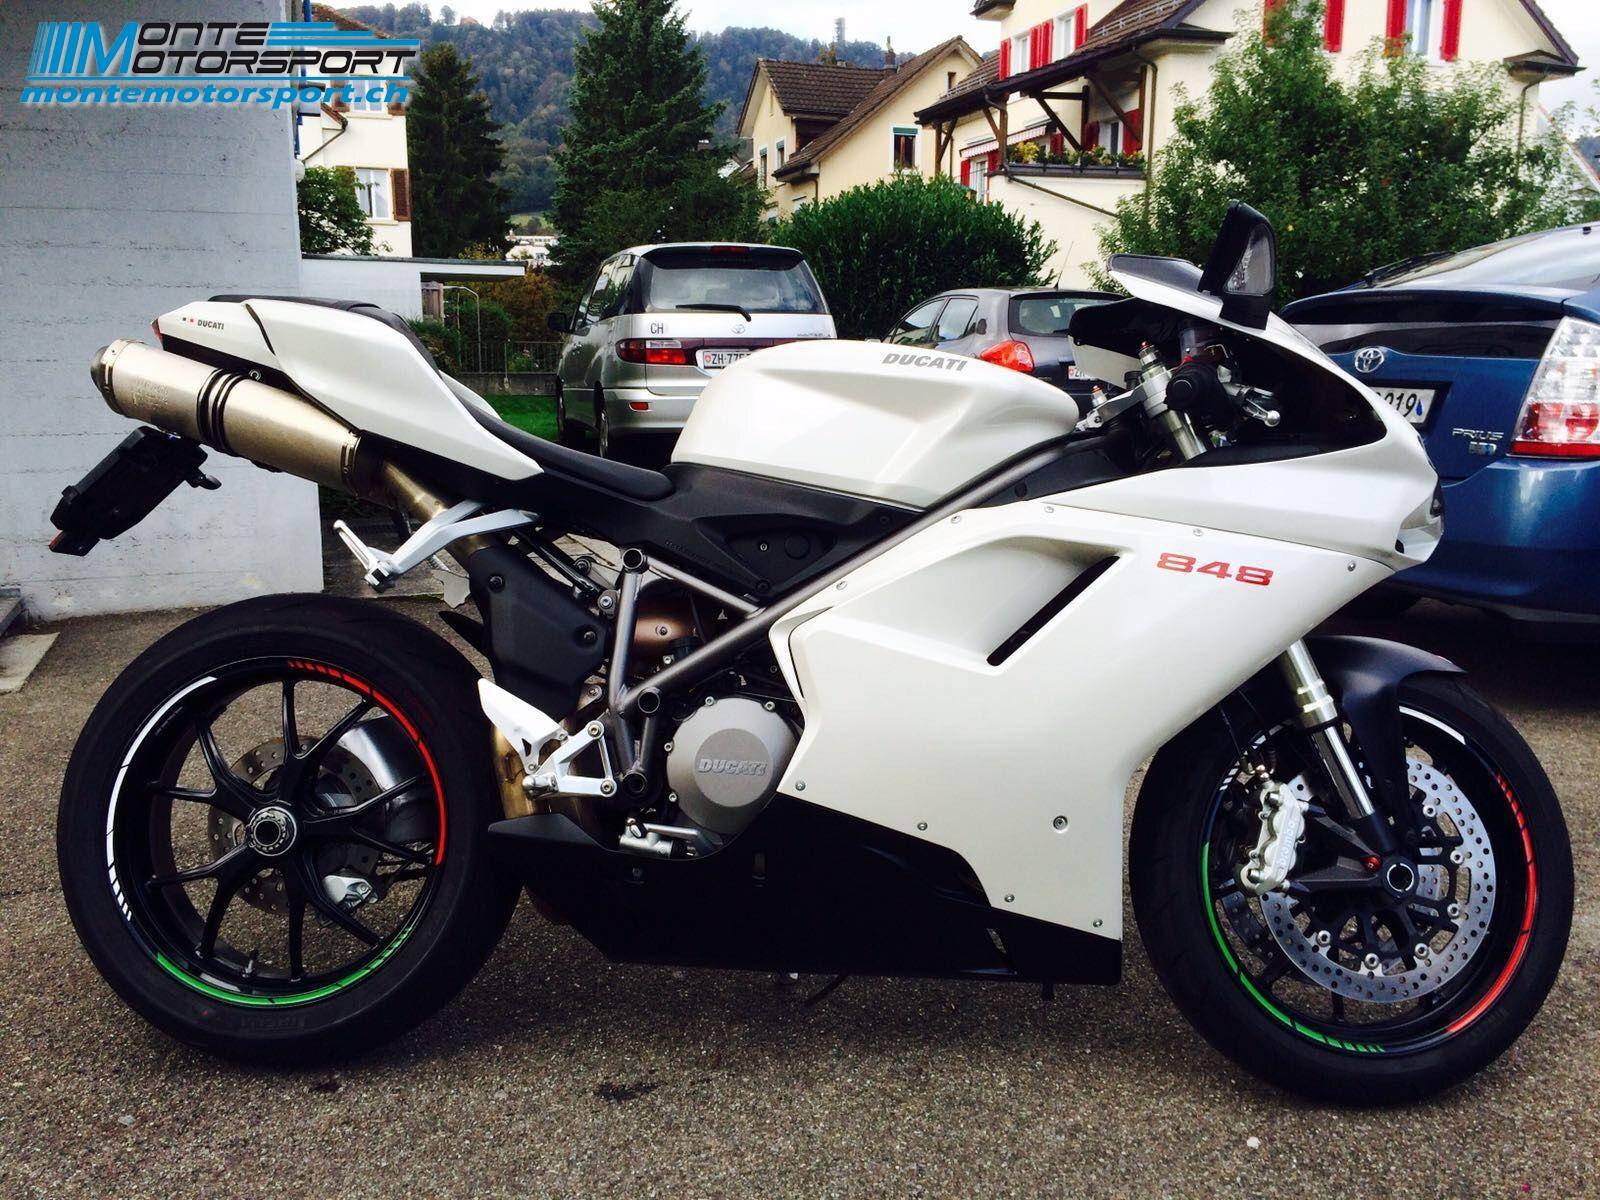 motorrad occasion kaufen ducati 848 superbike montemotorsport adliswil. Black Bedroom Furniture Sets. Home Design Ideas